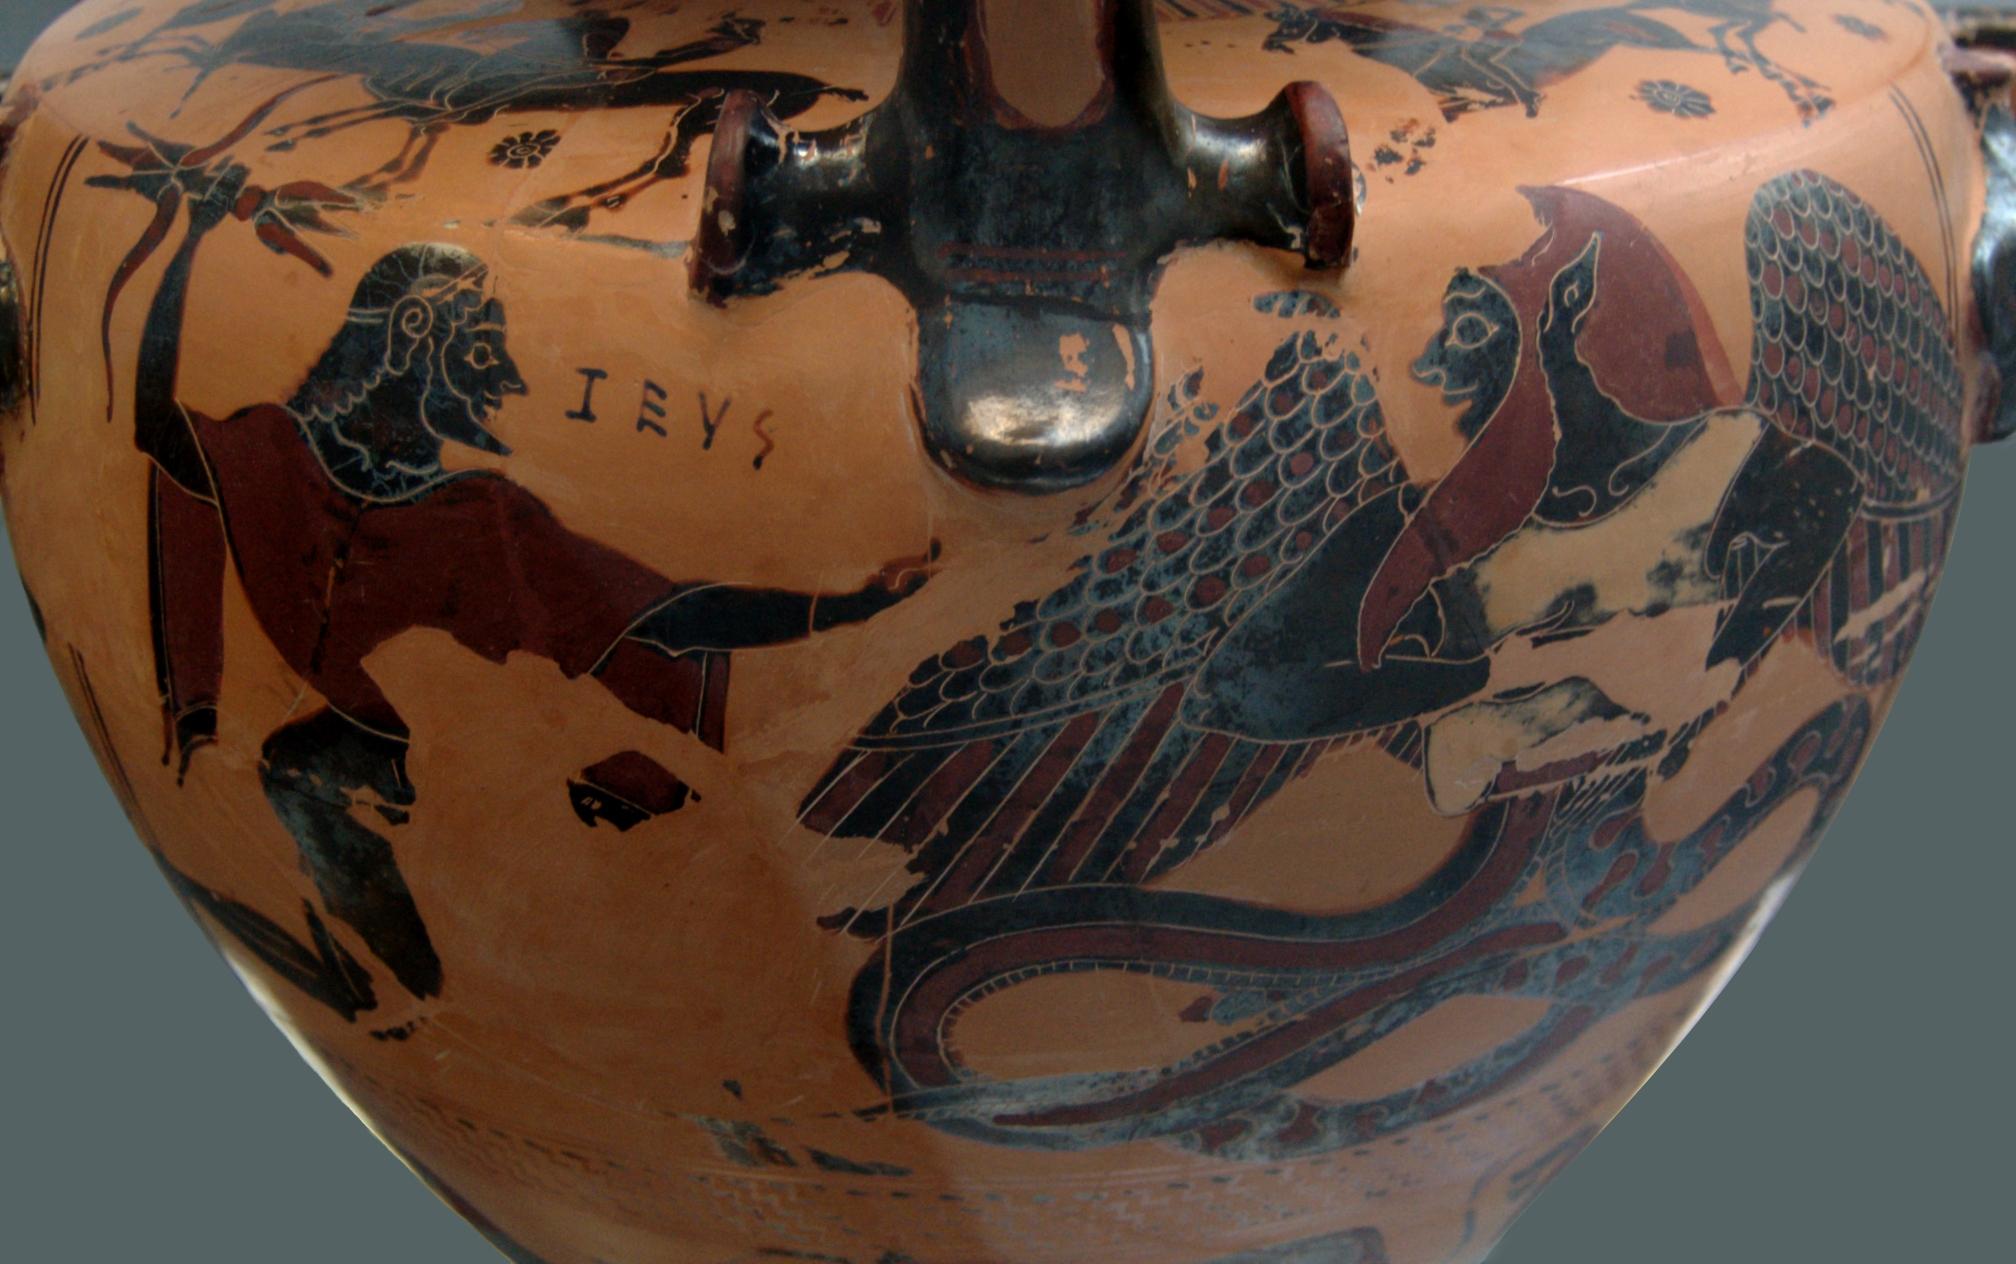 http://upload.wikimedia.org/wikipedia/commons/d/d9/Zeus_Typhon_Staatliche_Antikensammlungen_596.jpg